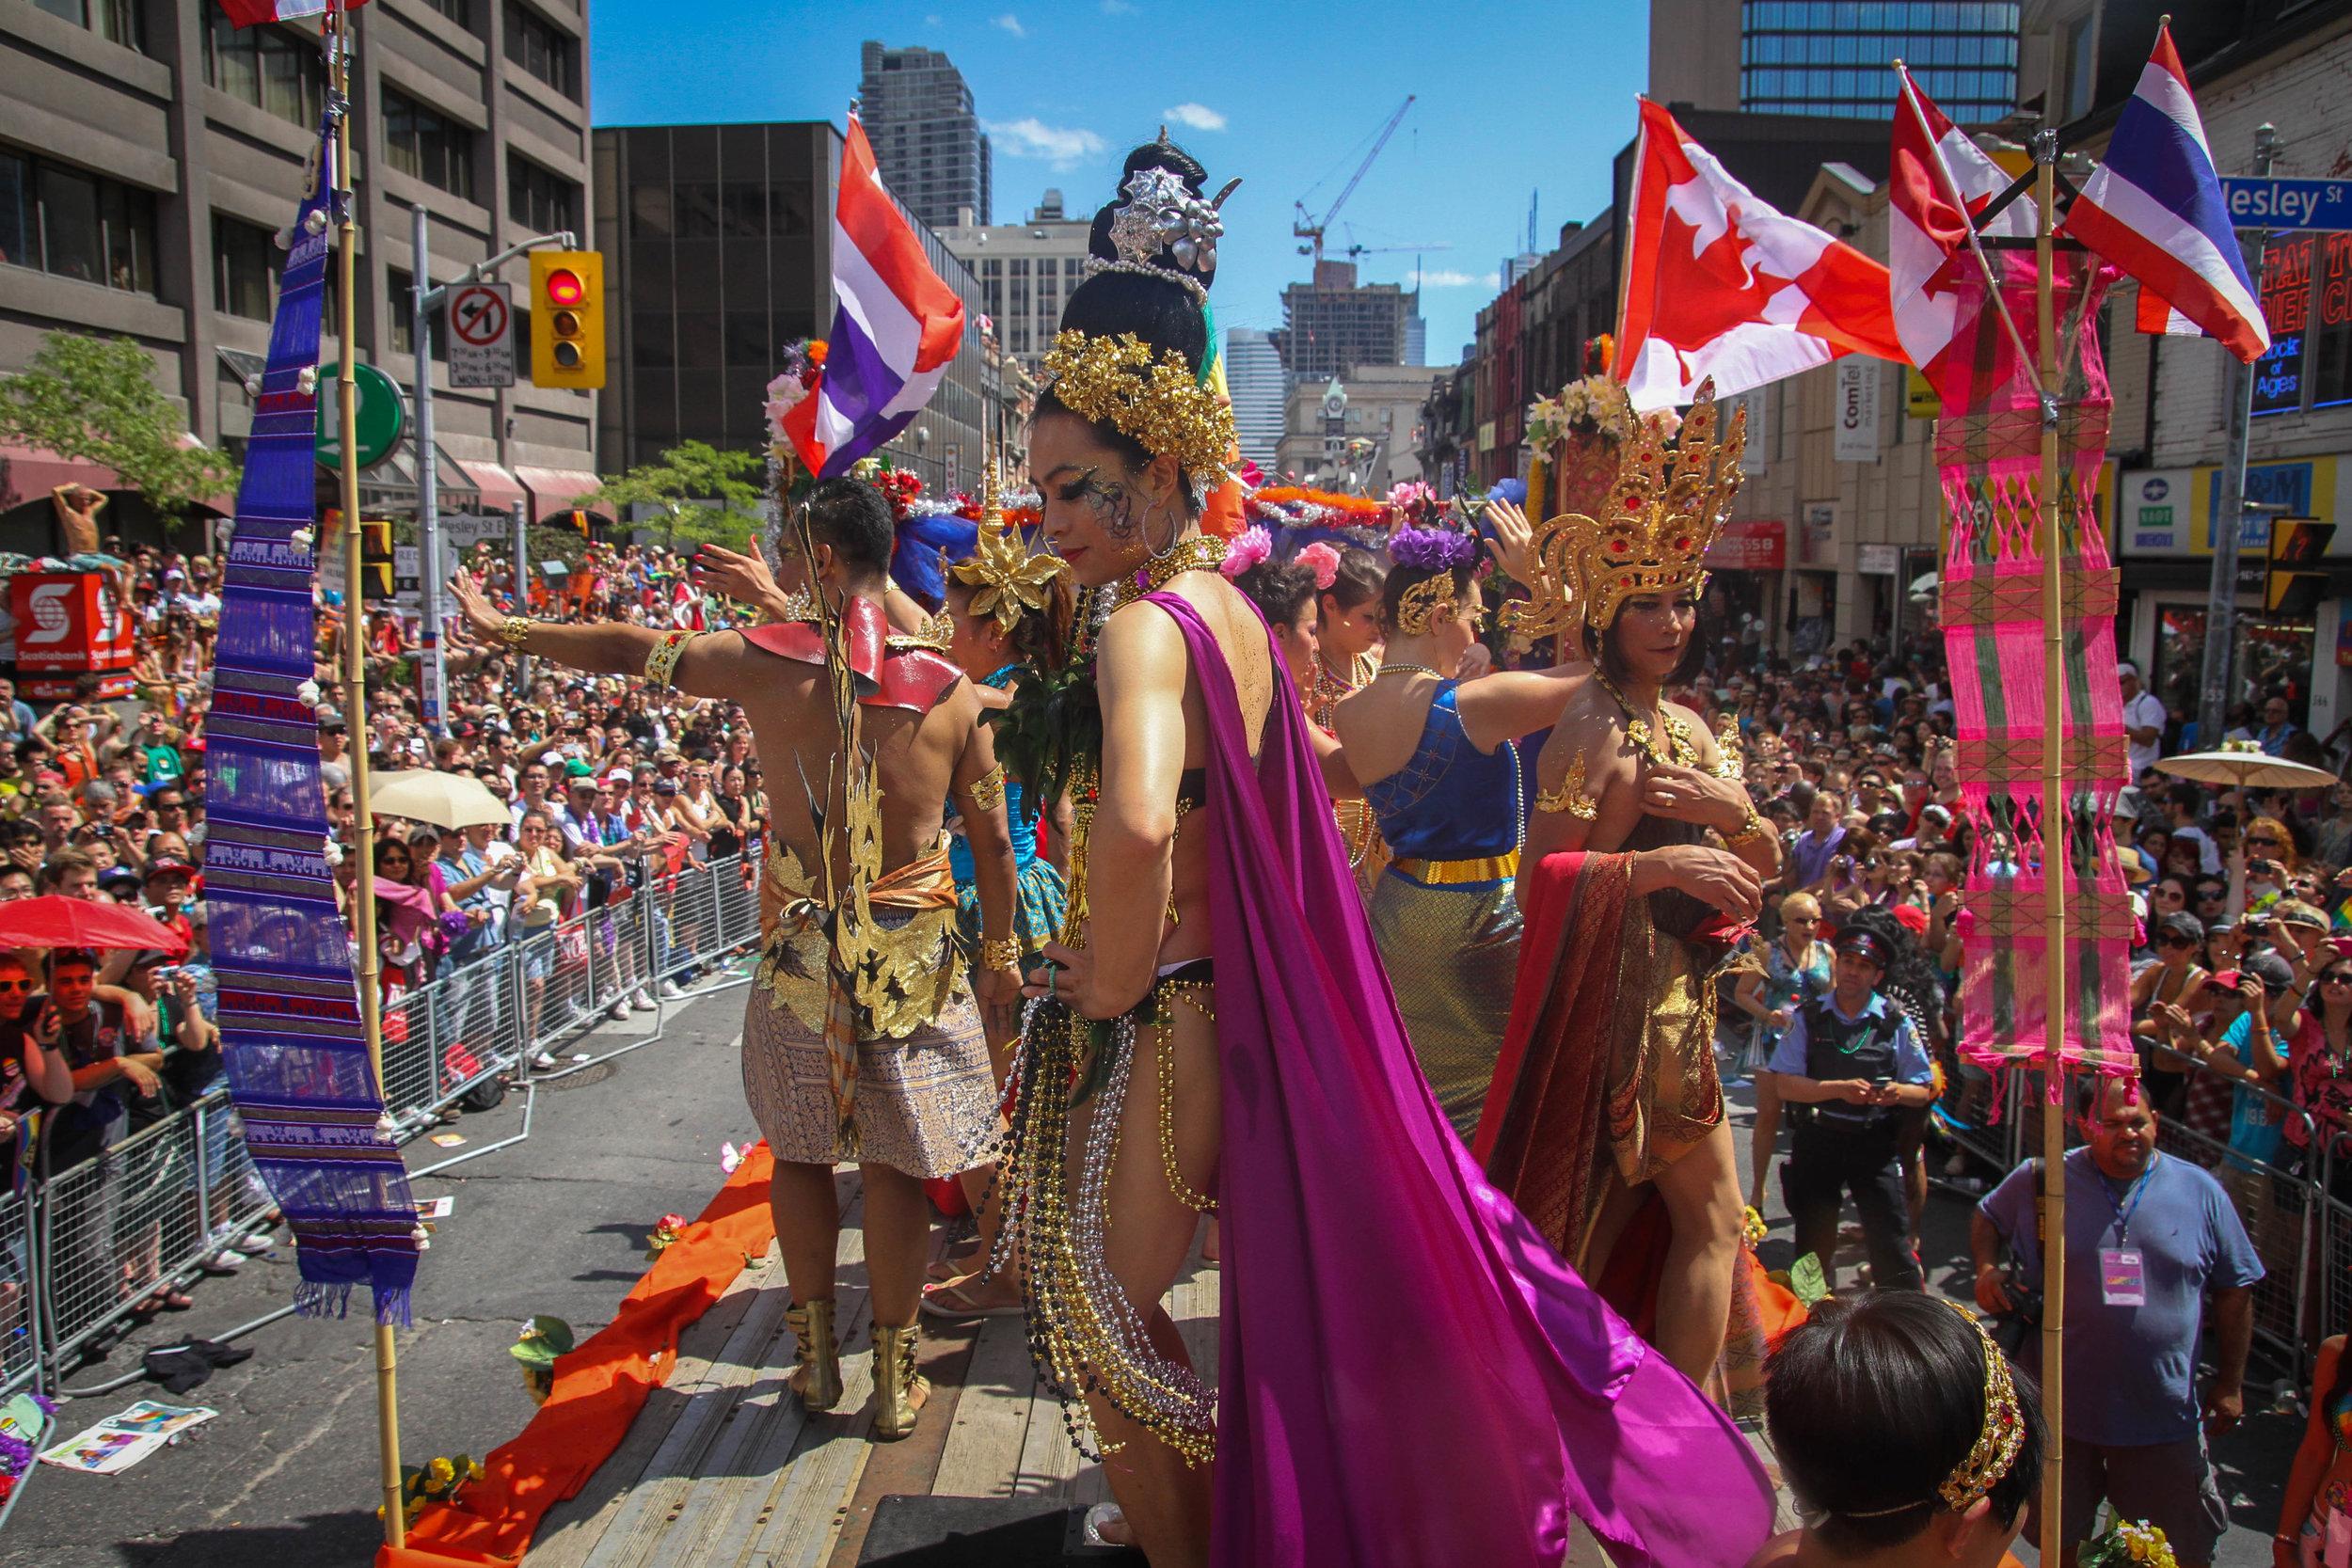 Toronto Pride Parade - Thailand Float